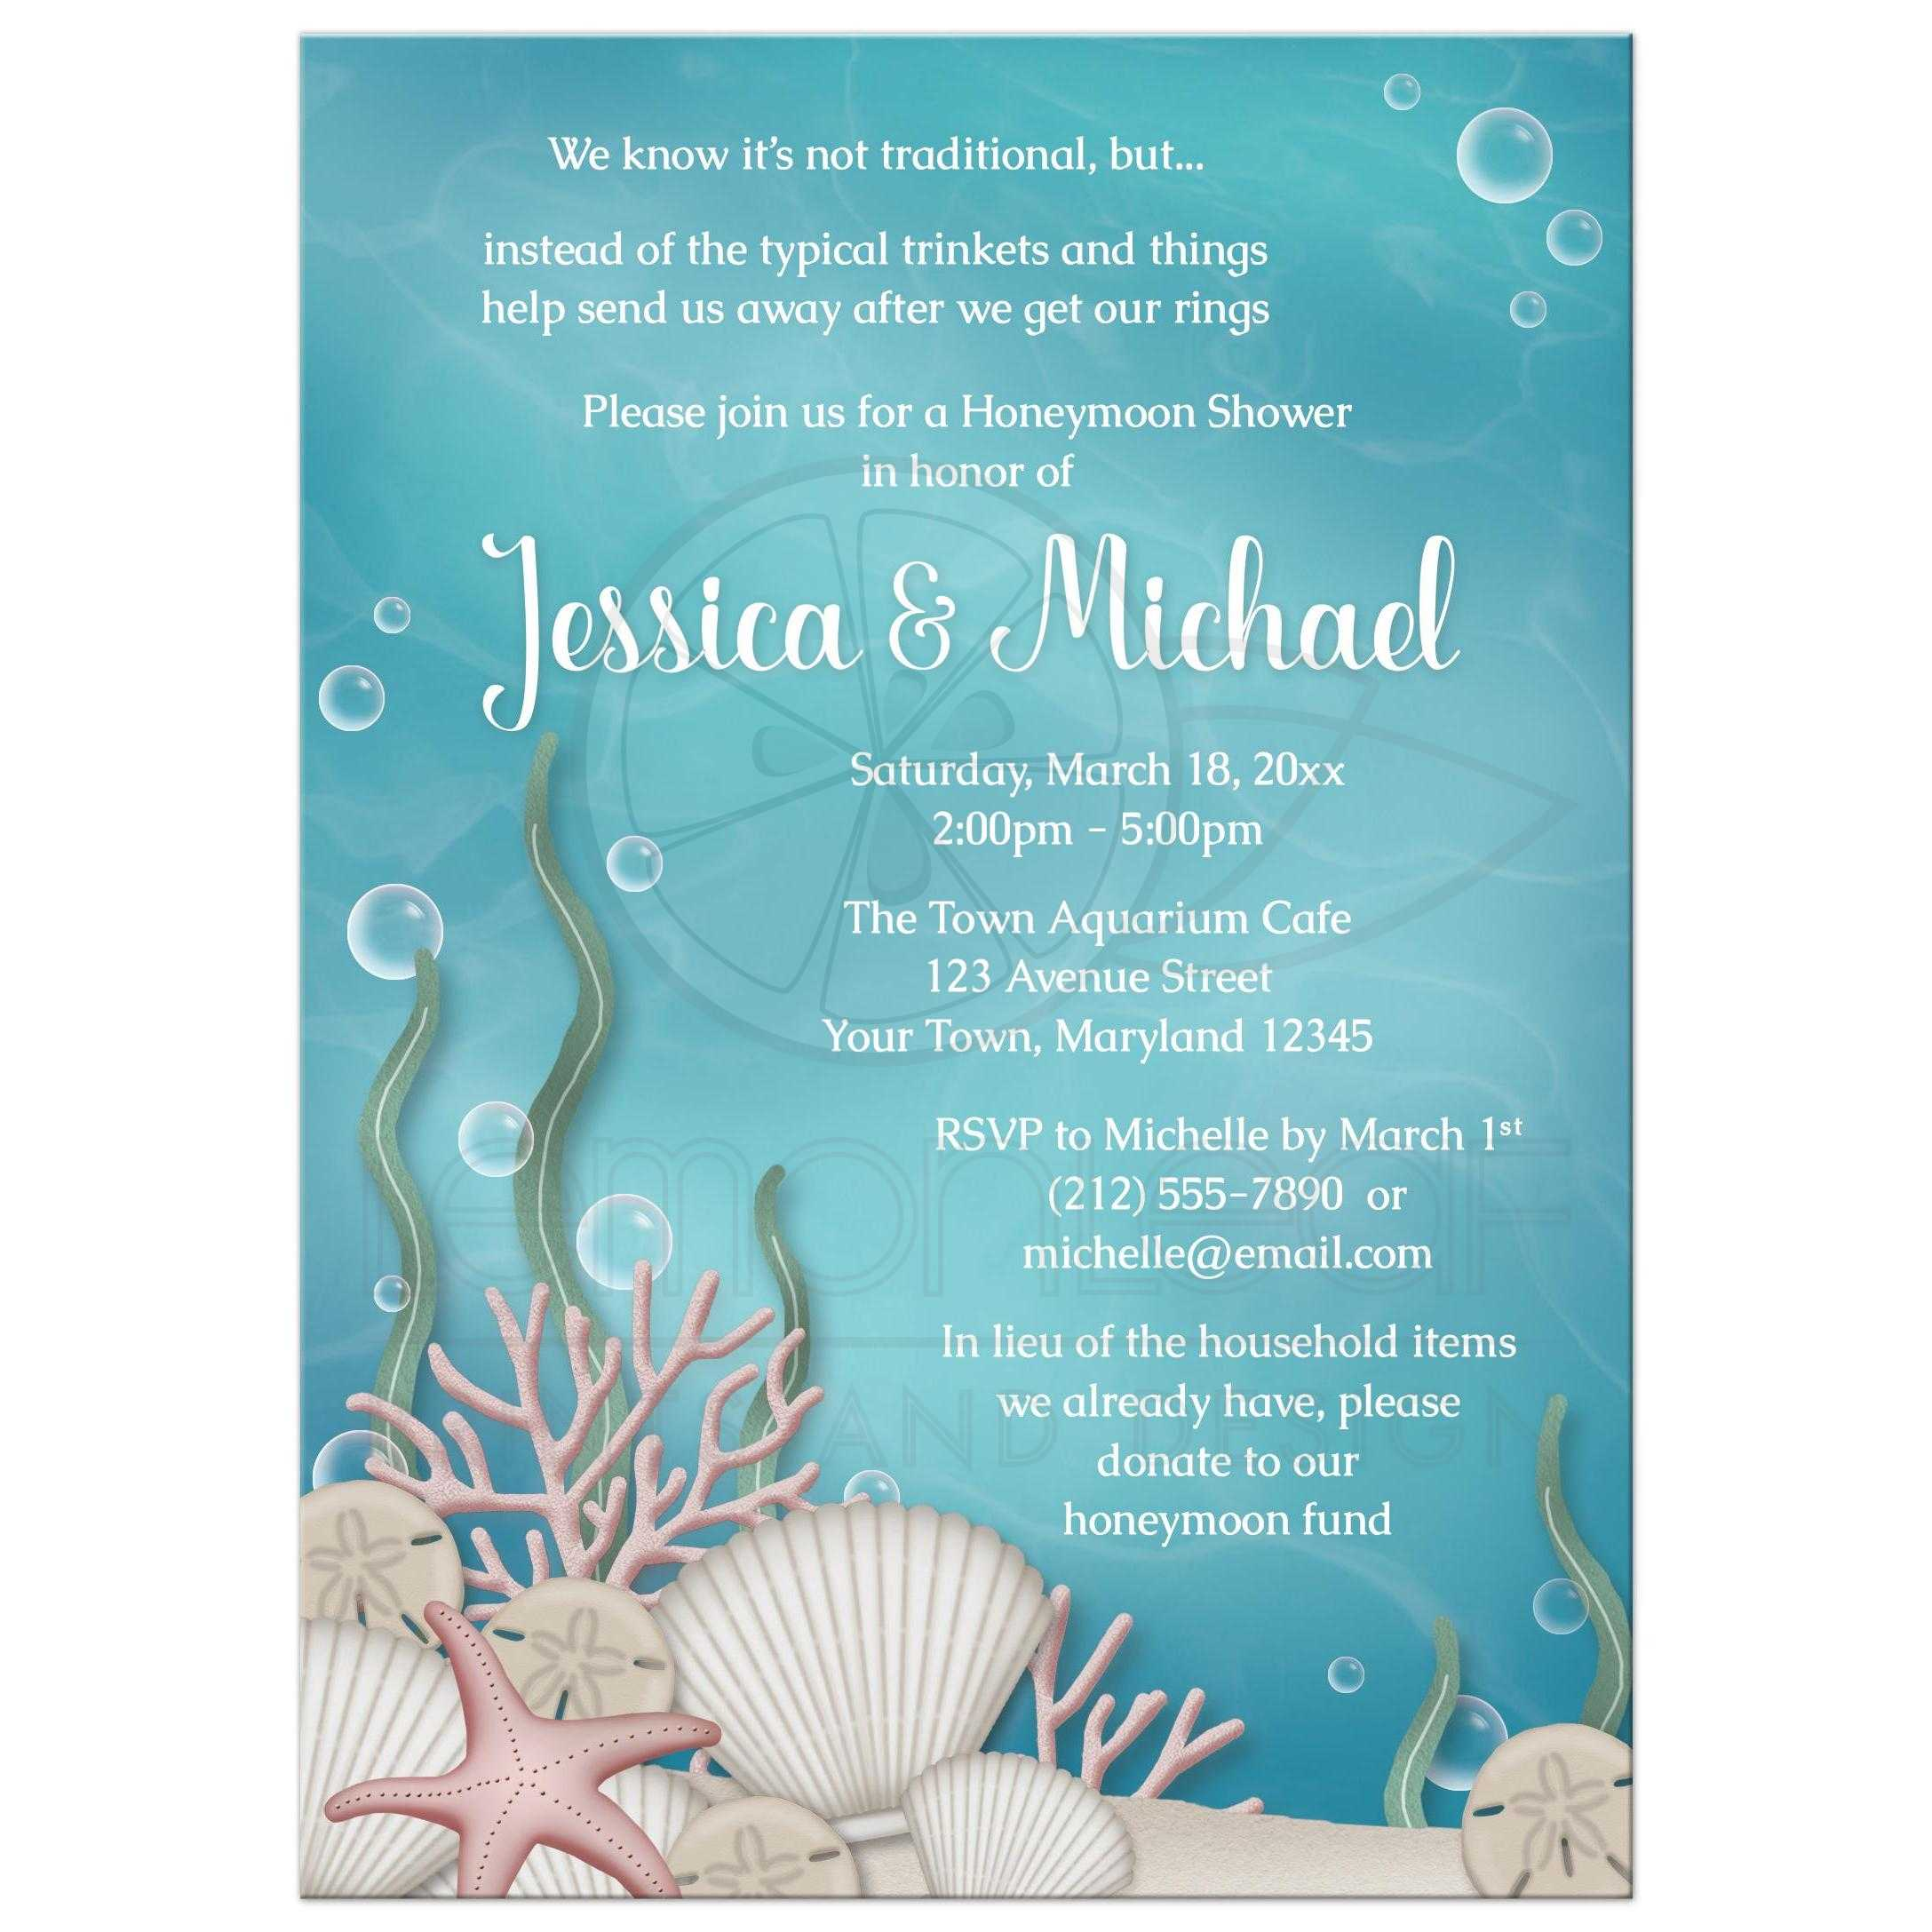 52857 Rectangle Whimsical Under The Sea Honeymoon Shower Invitations Jpg T 1520704045